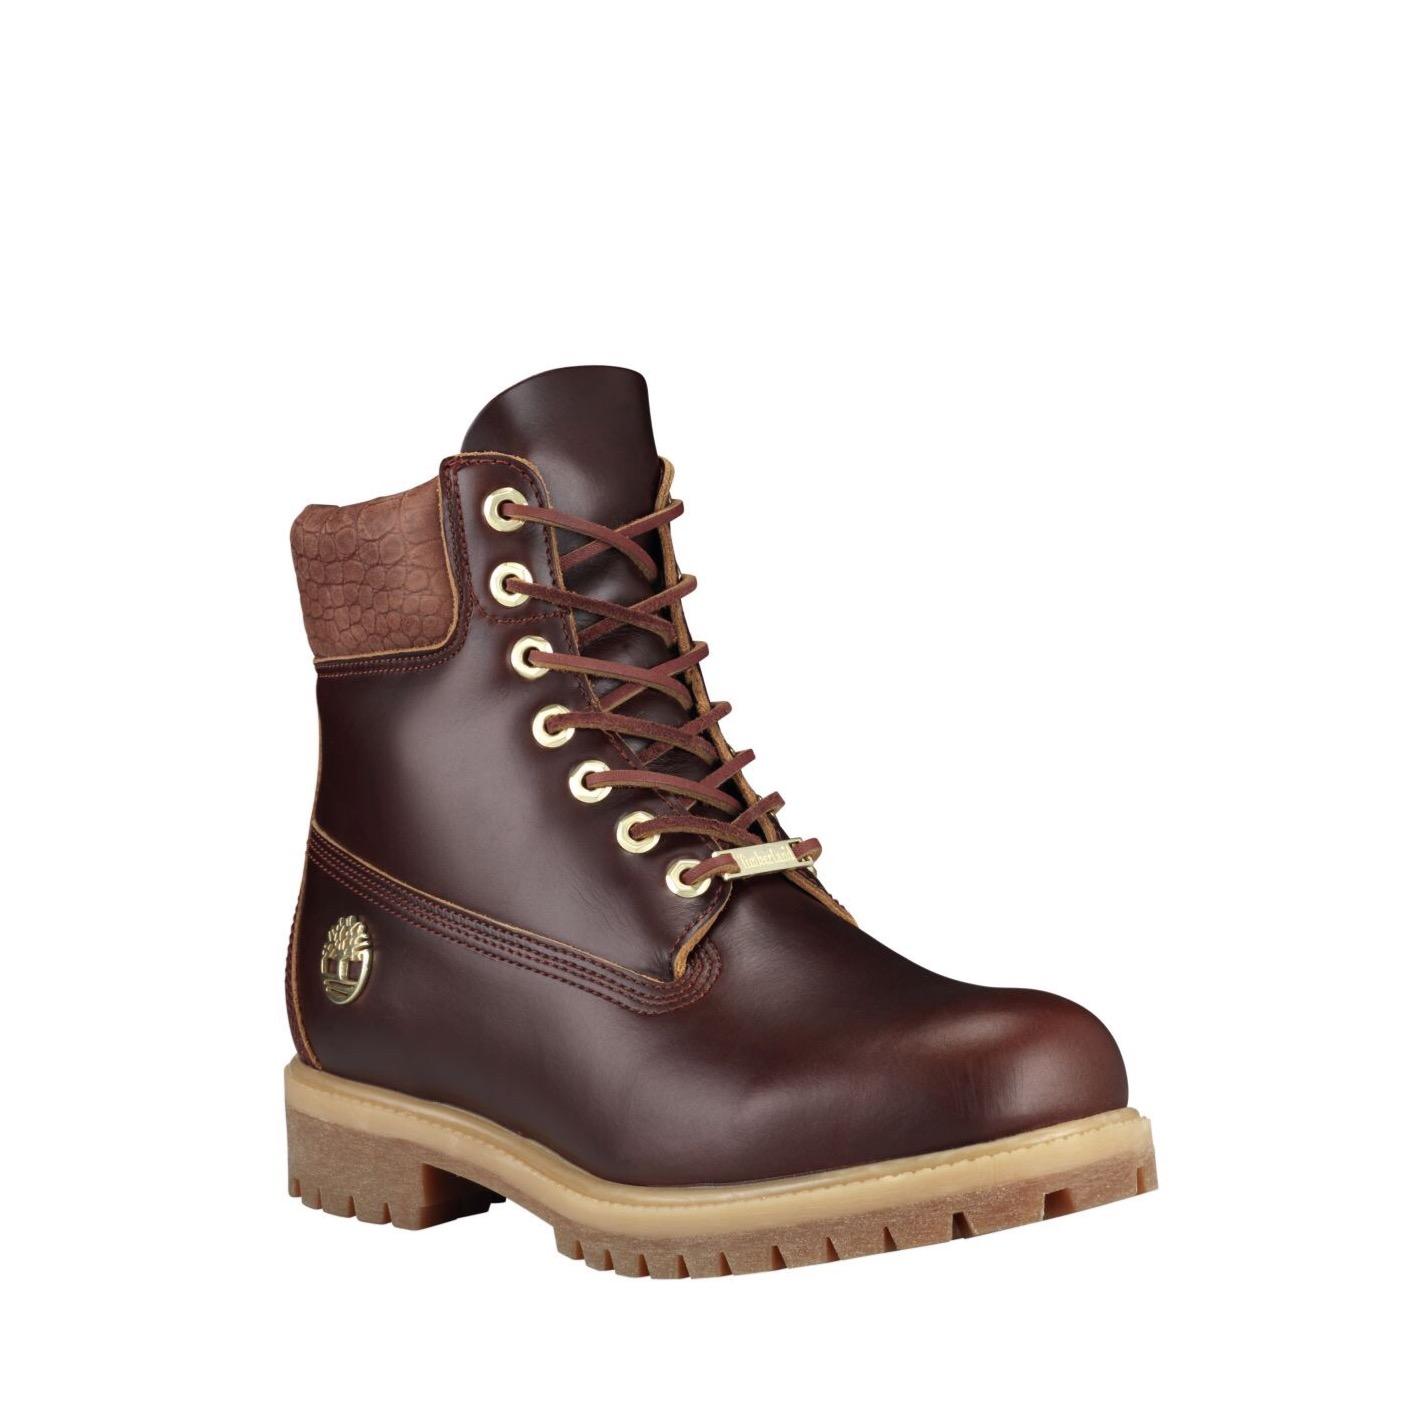 75ed8004677 Timberland 6-inch Premium Waterproof Boots in Burgundy Exotic Full Grain  Leather — MAJOR